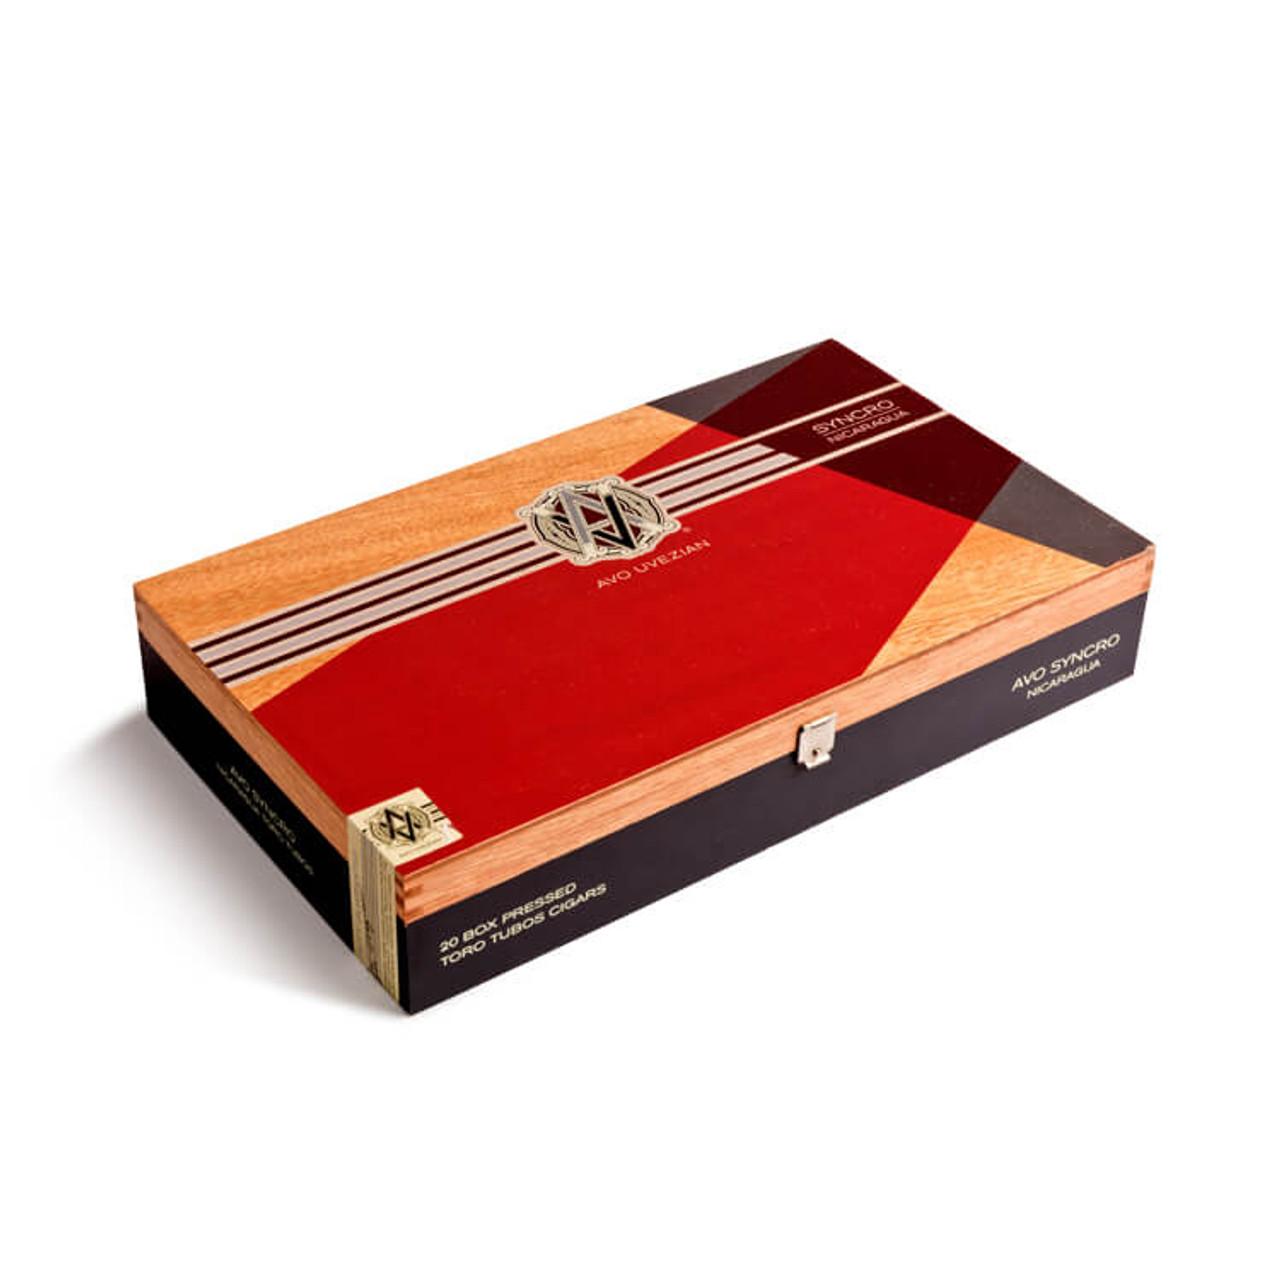 AVO Syncro Nicaragua Toro Tubo Cigars - 6 x 54 (Box of 20)